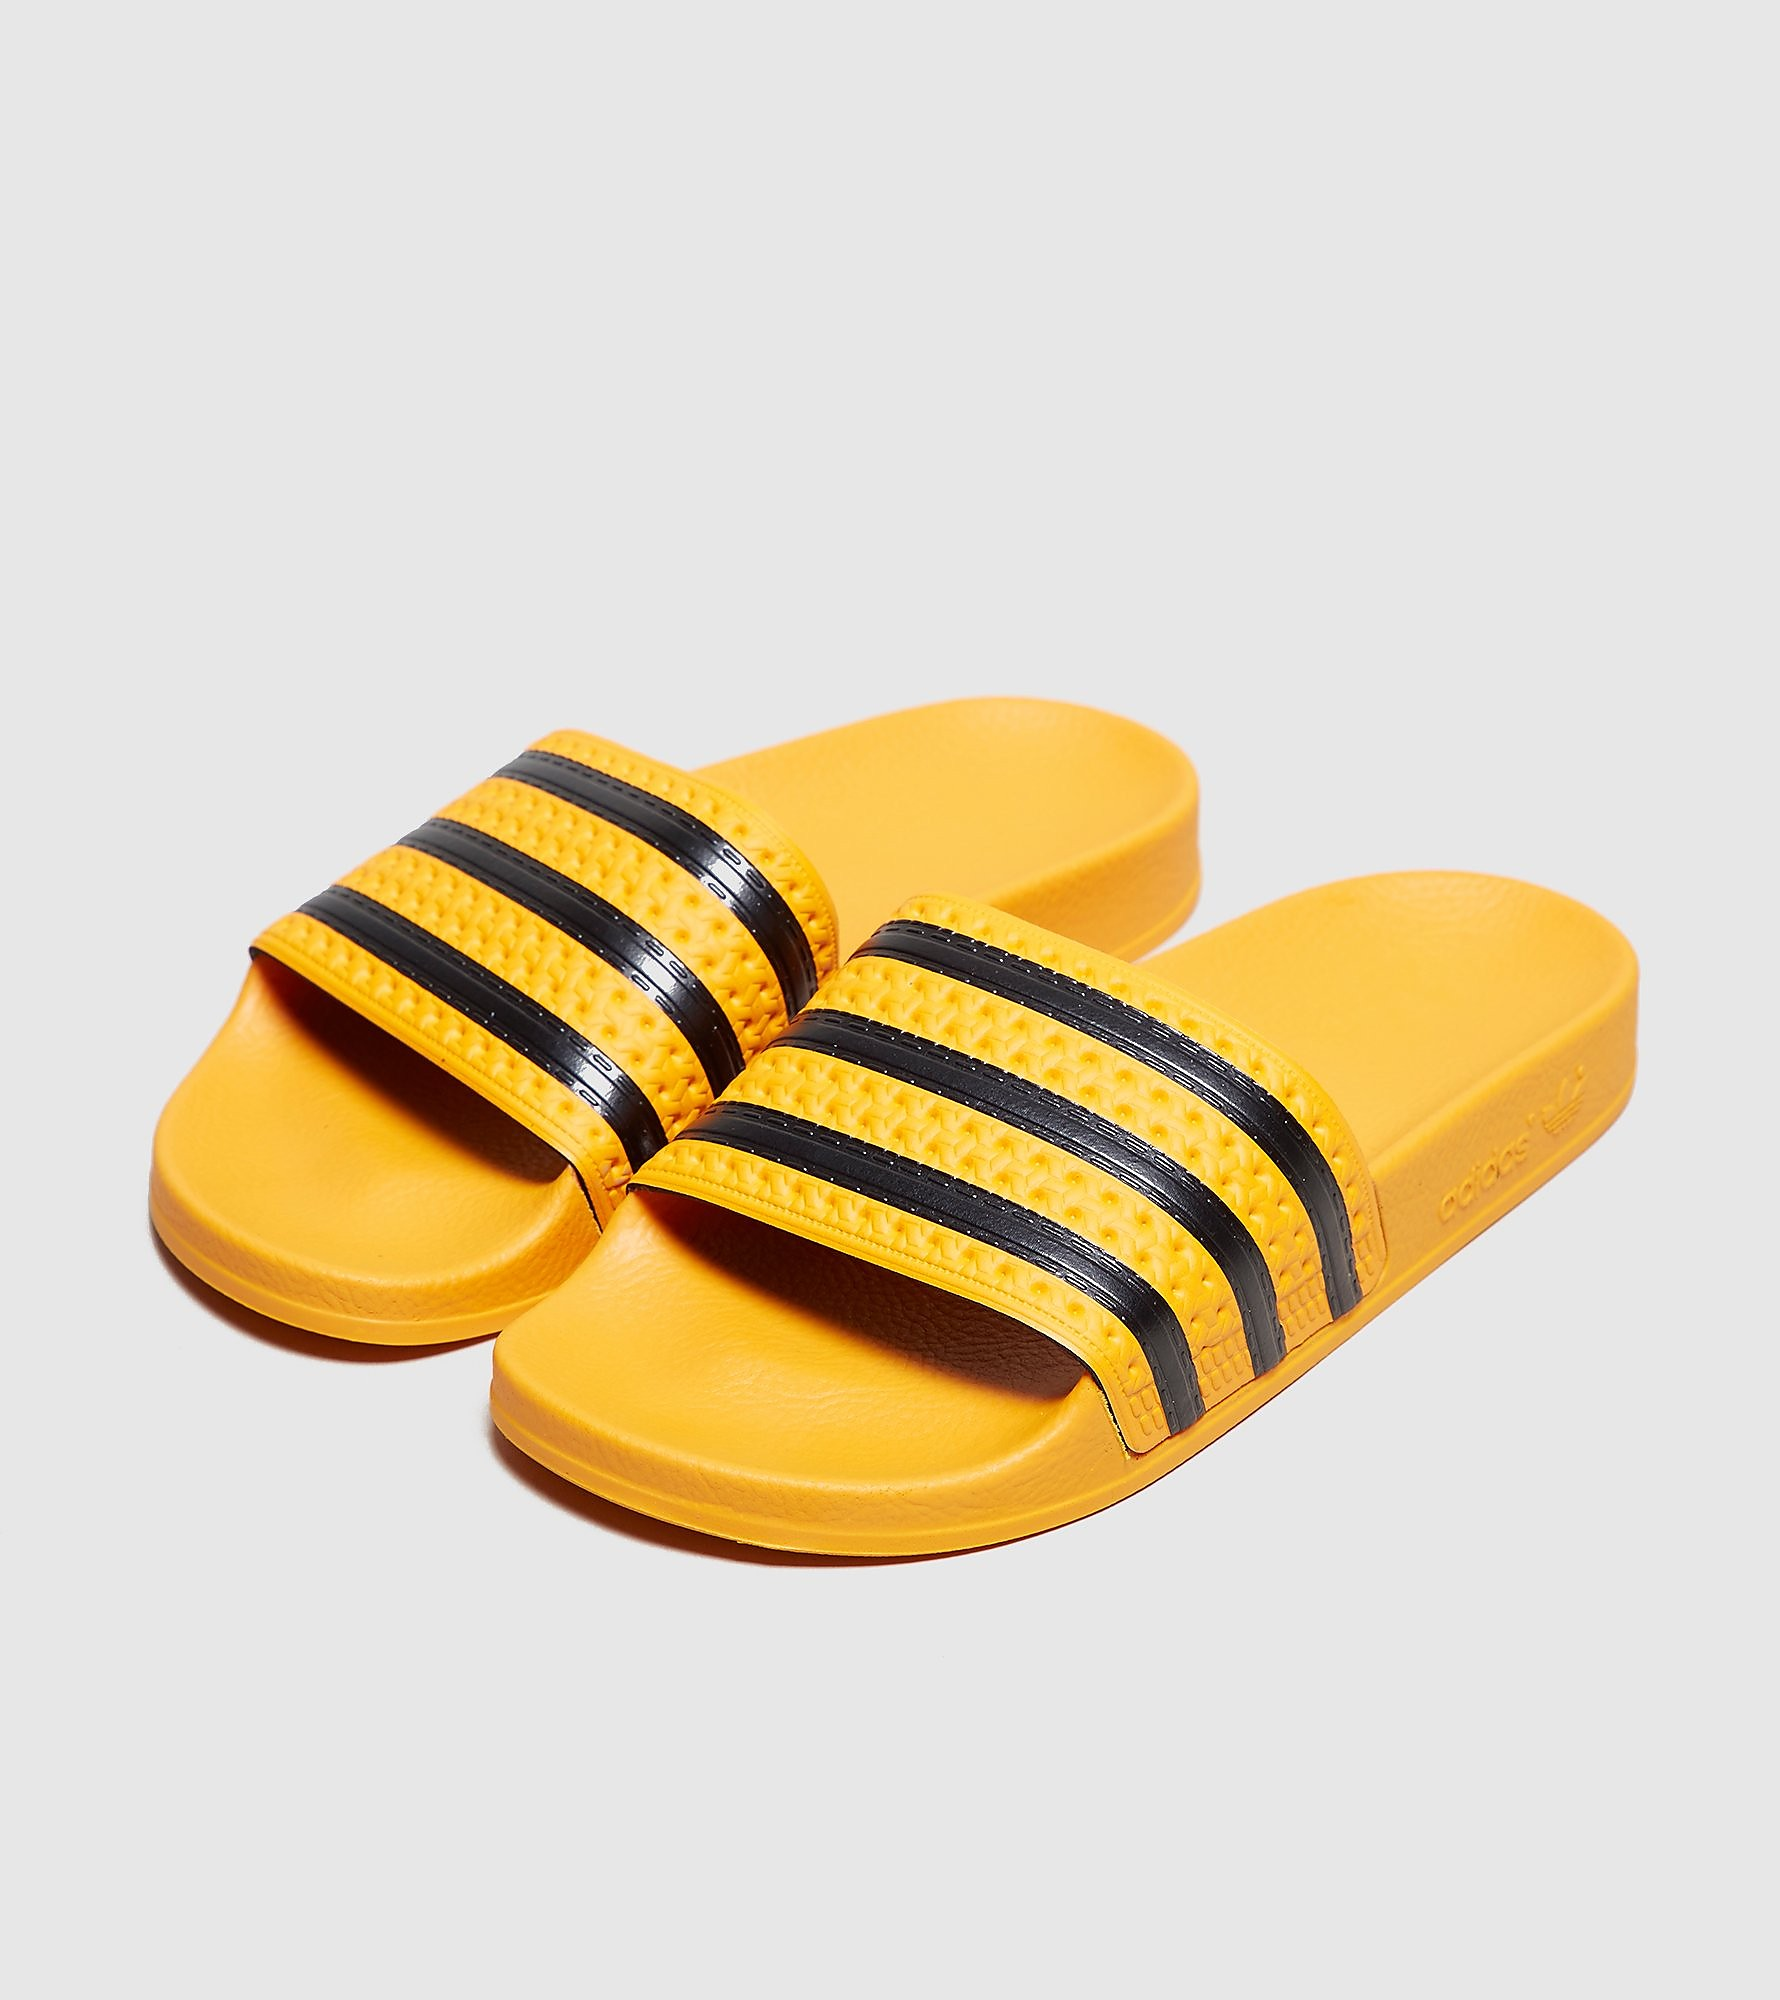 7487b2e32 adidas Originals Adilette Slides Women s (oranje). Stijlcode  CQ3099 REAL GOLD  S18 CORE BLACK REAL GOLD S18